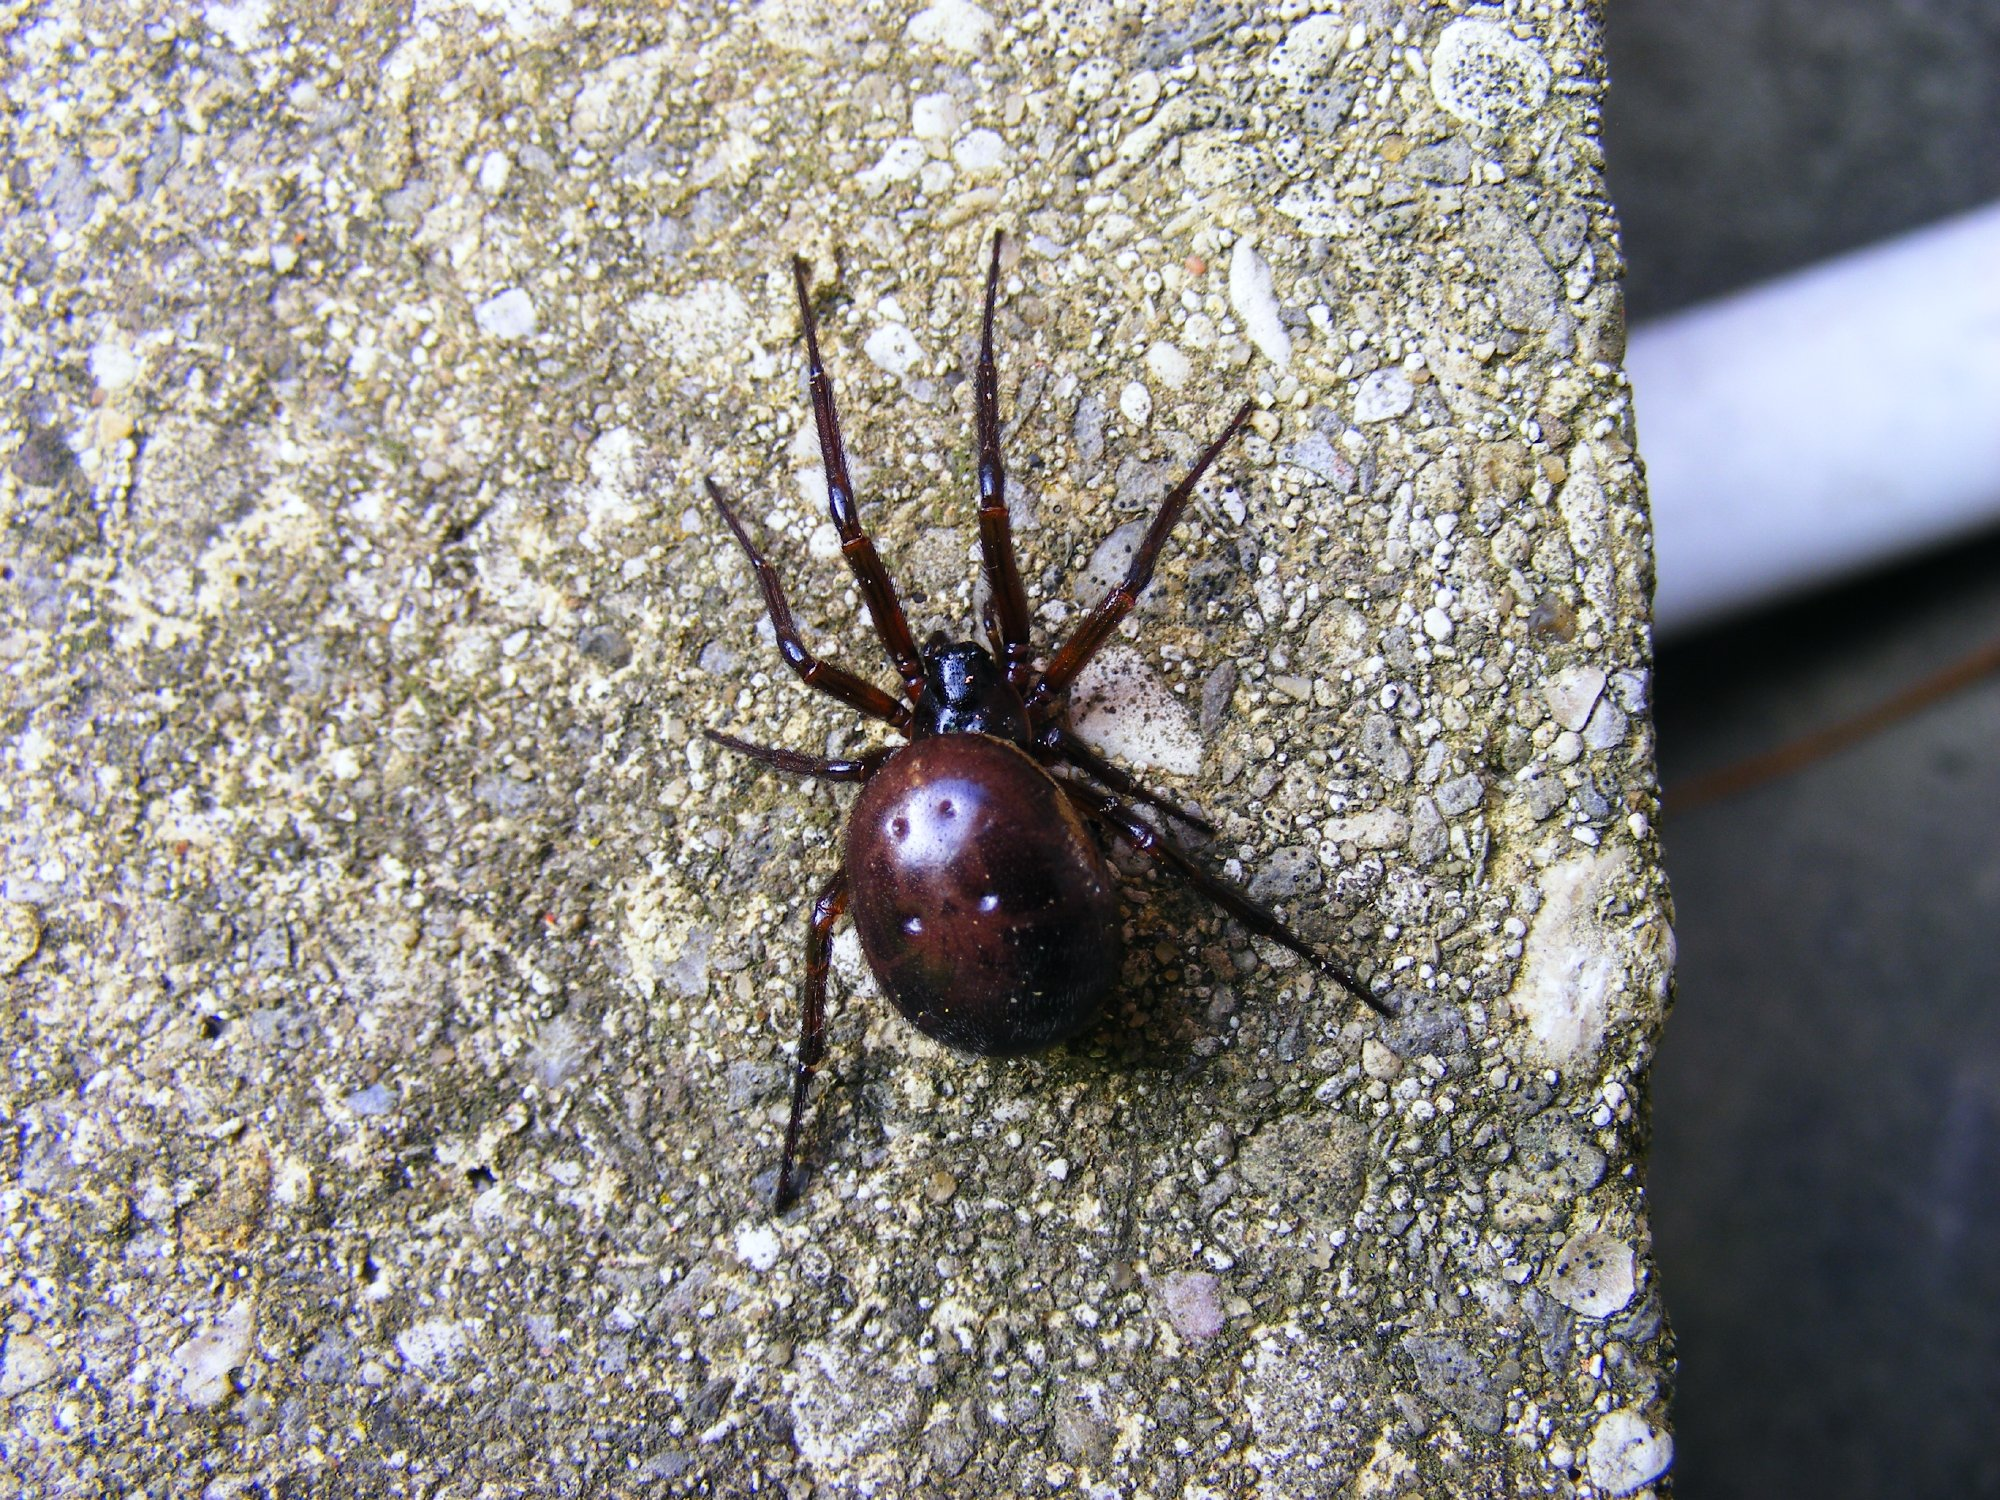 Noble false widow spider (Steatoda nobilis)